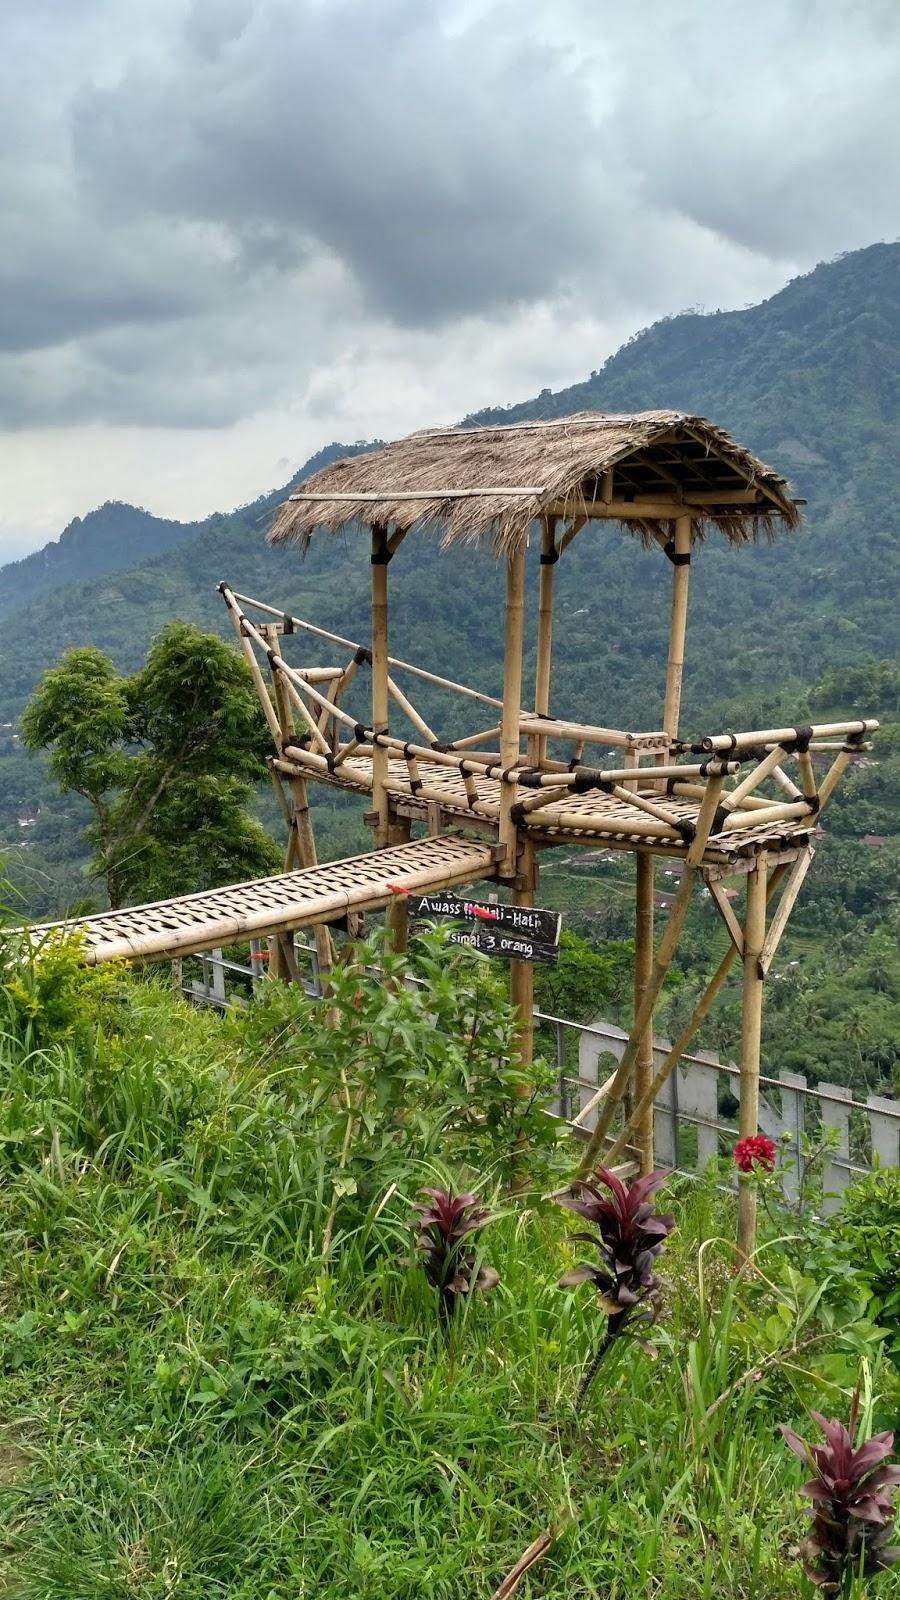 Indahnya Panorama Alam Punthuk Sukmojoyo Traveling Diary Baca Menikmati Keindahan